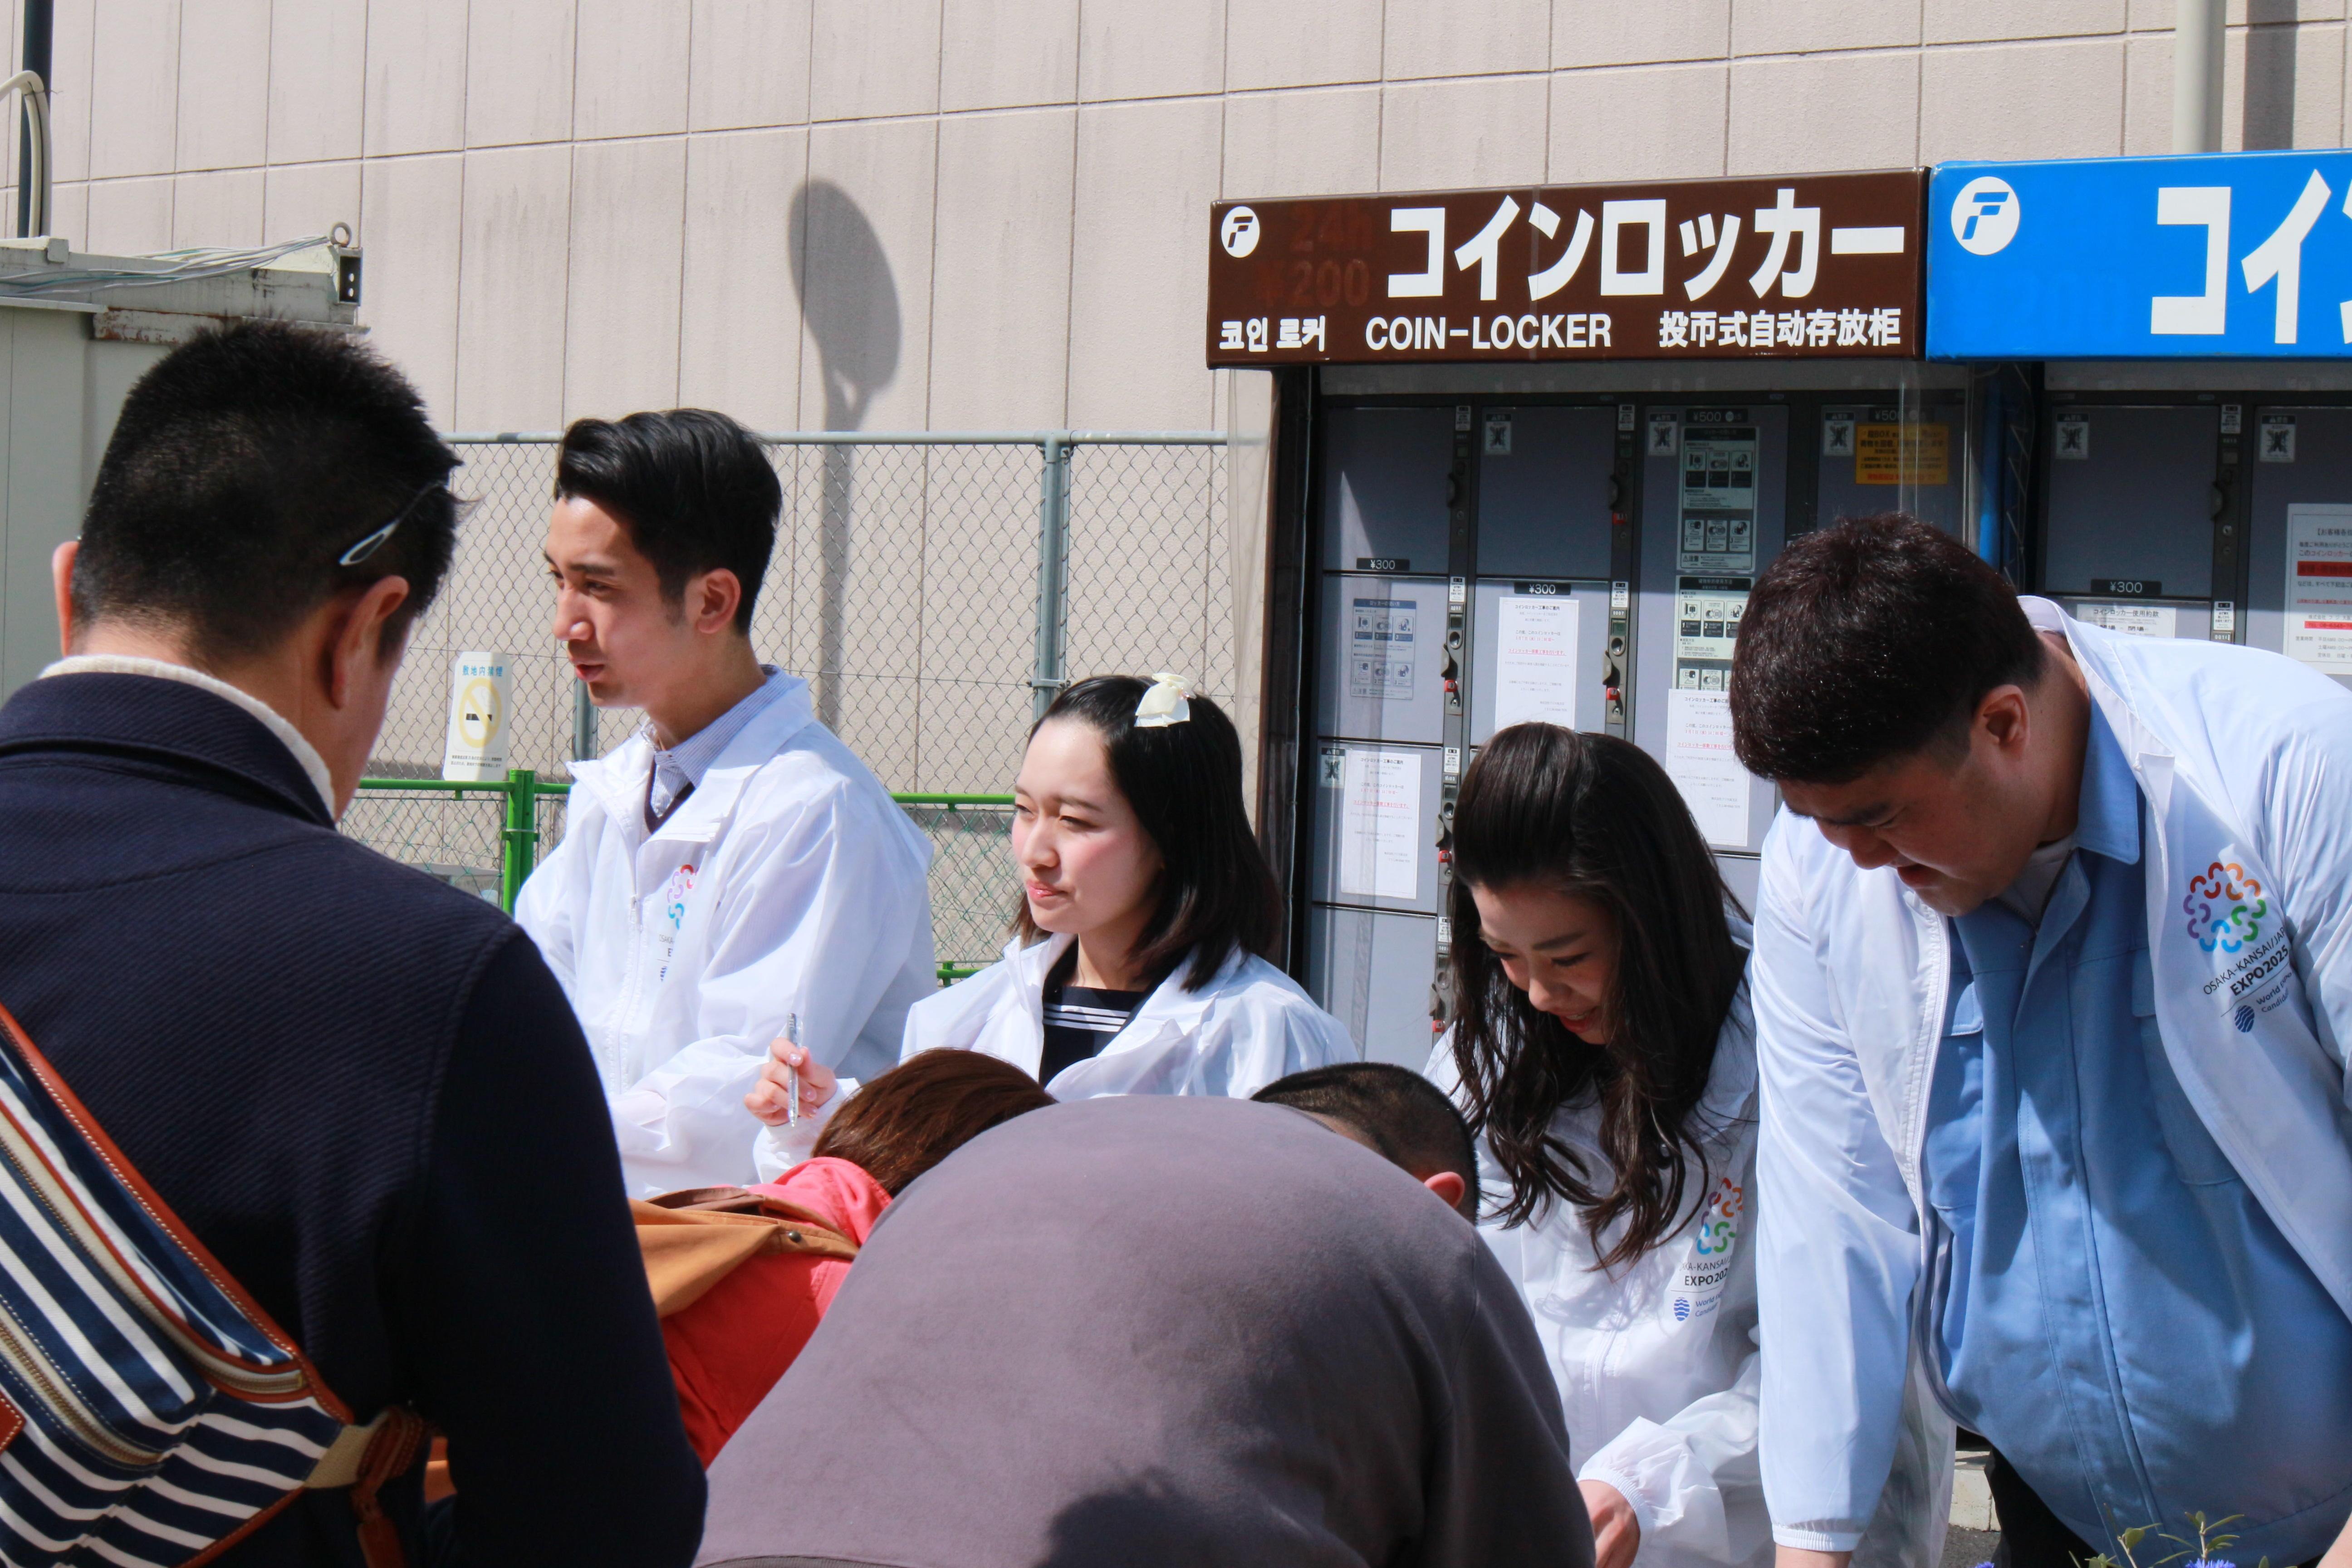 http://news.yoshimoto.co.jp/20180304181708-e4936b5cef2c099ae99db2ba03b6aadf7751368e.jpg